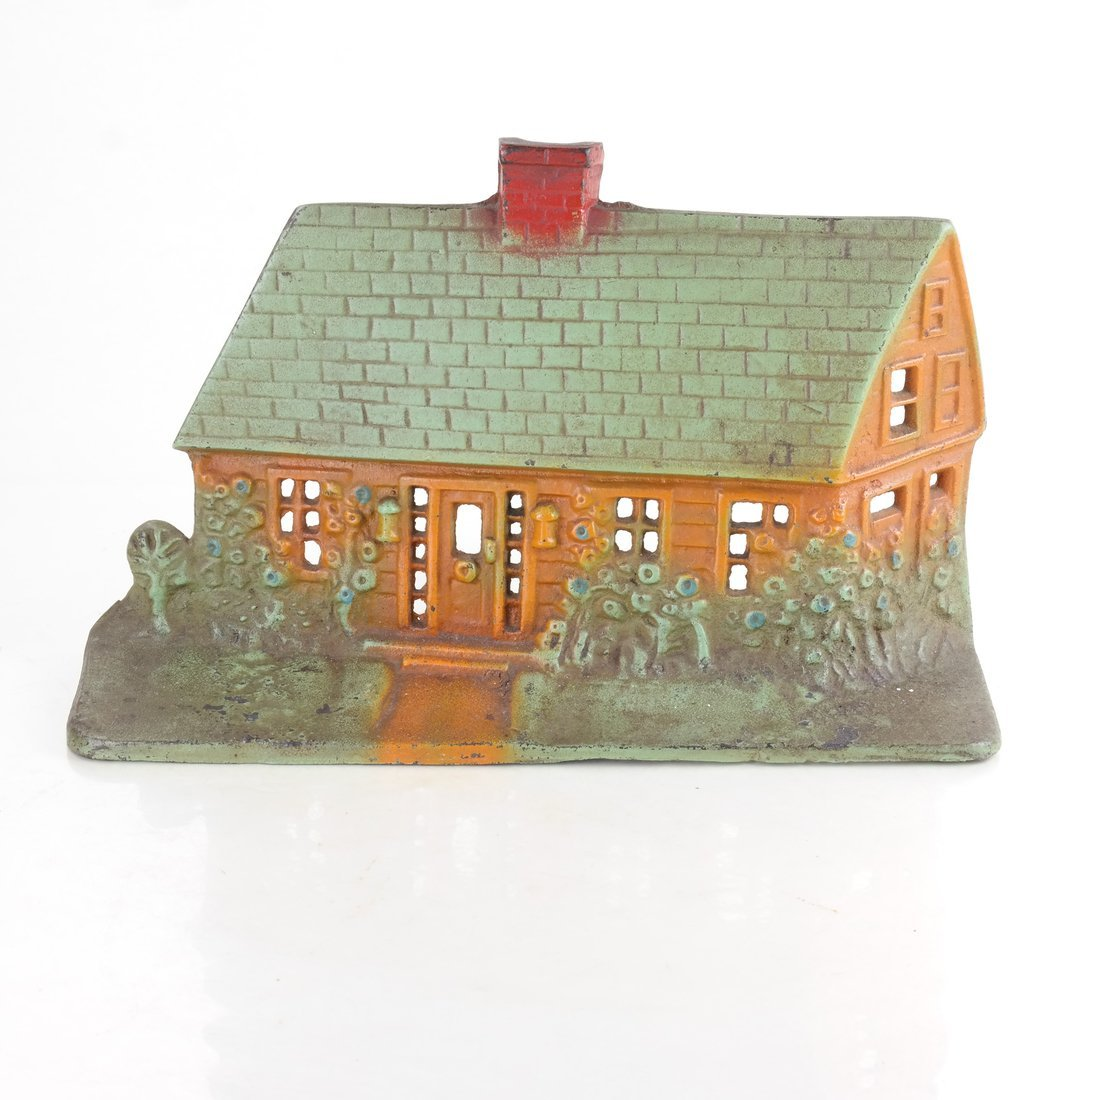 Painted Cast Iron Cottage Doorstop